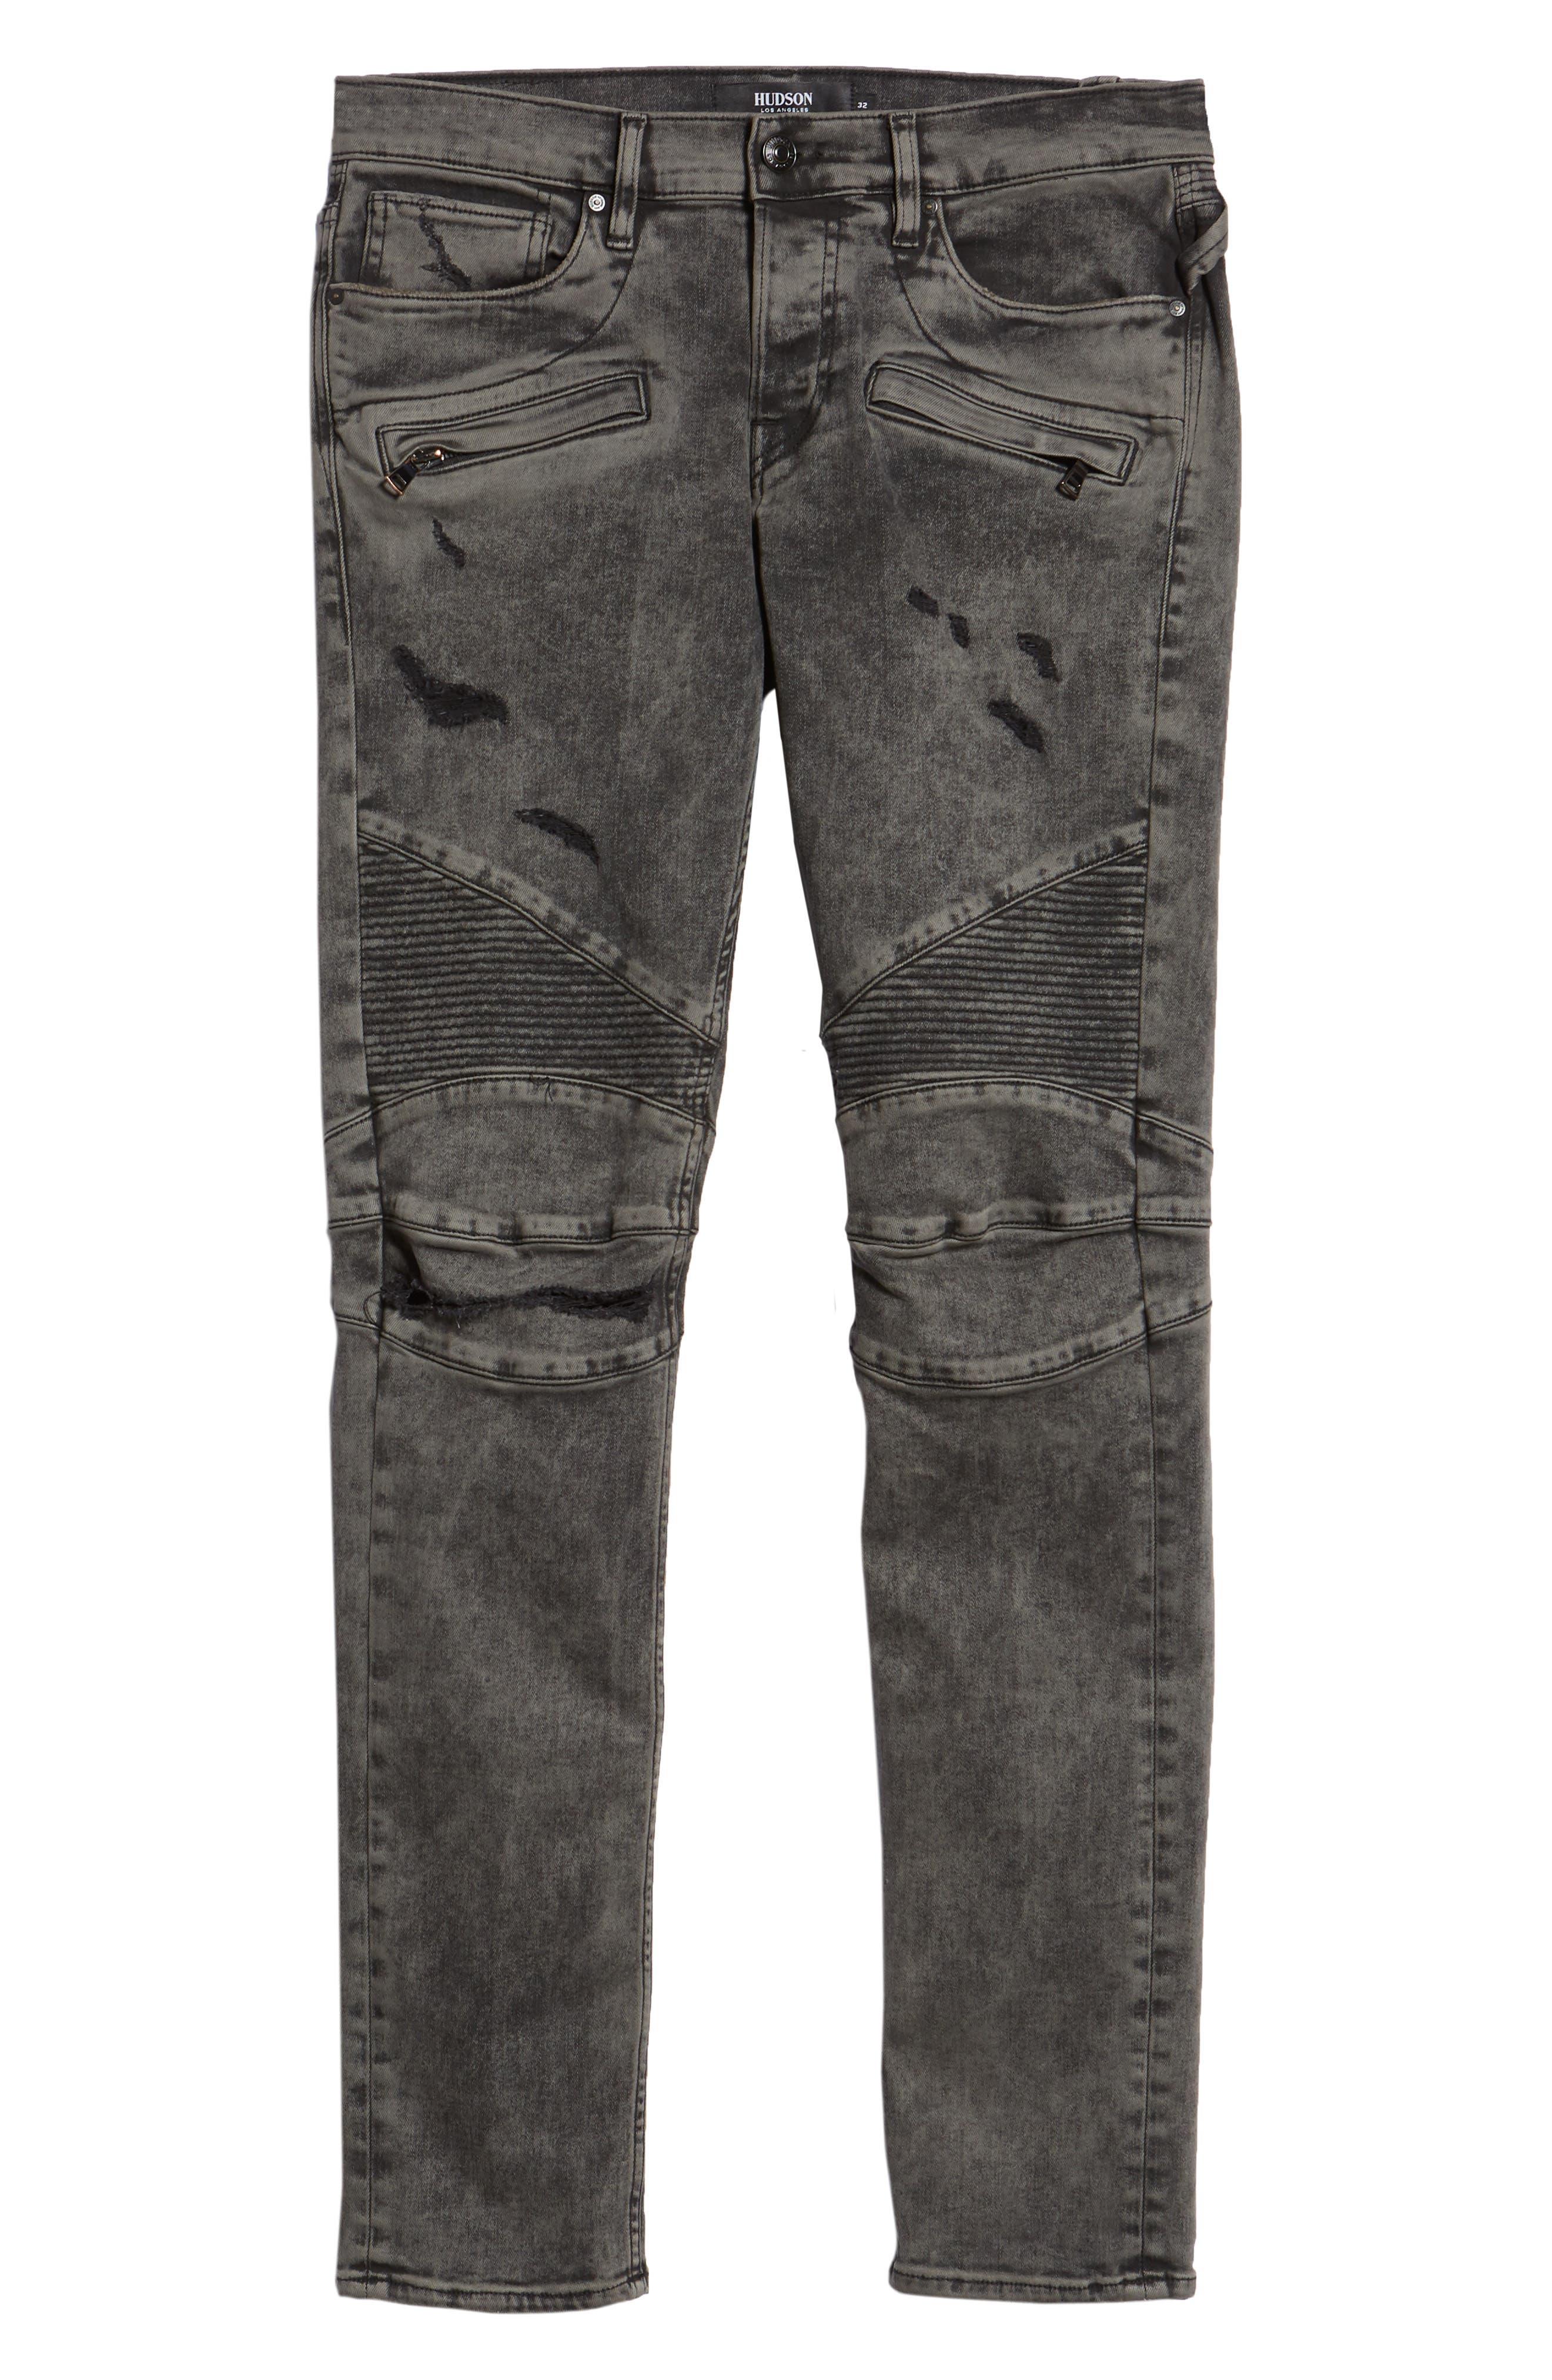 Blinder Biker Skinny Fit Jeans,                             Alternate thumbnail 6, color,                             FADE GRAPHITE